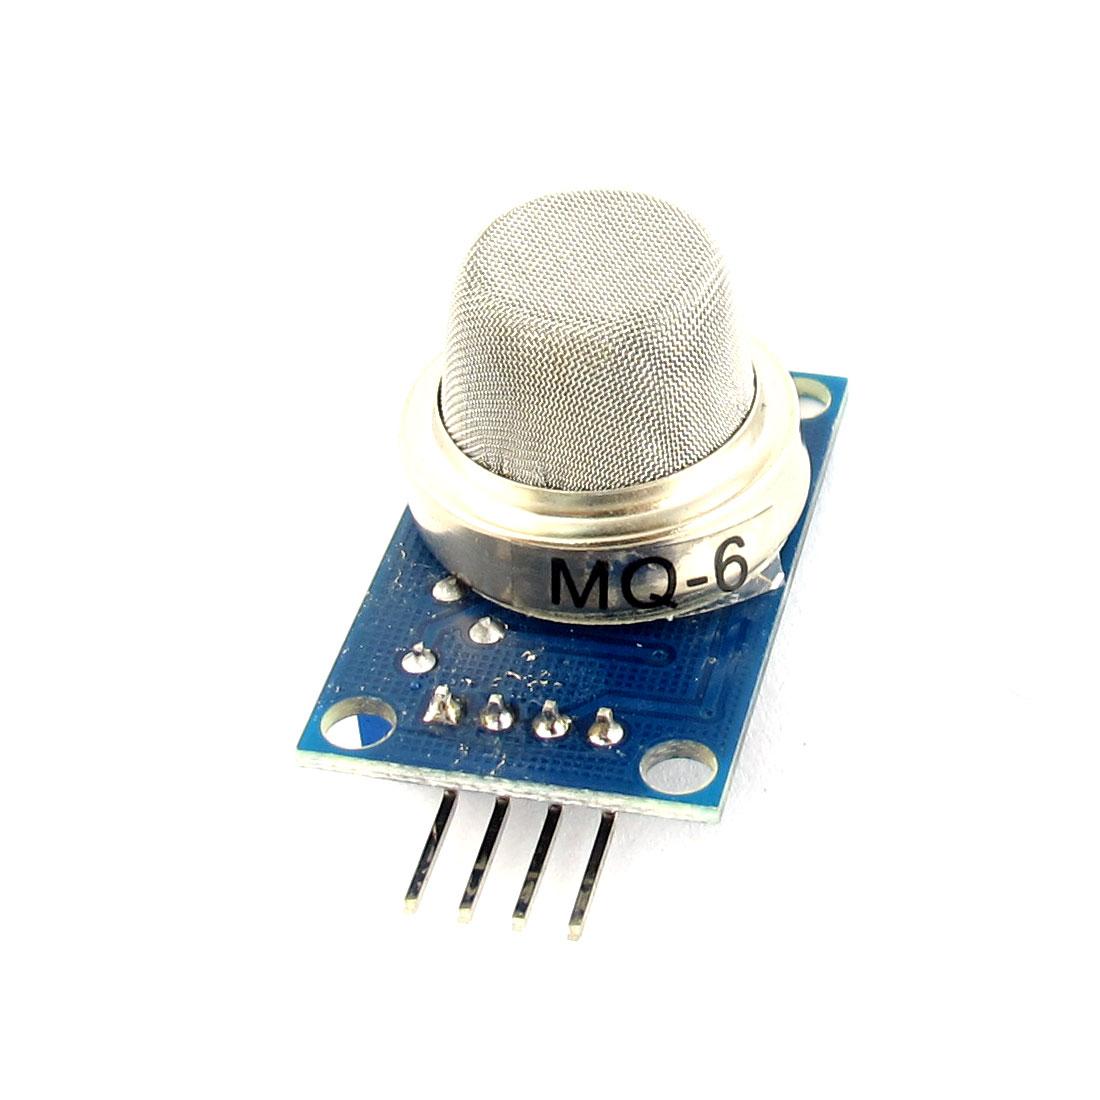 DC 5V 150mA MQ-6 Gas Sensor Module Liquefied Isobutane Propane Detection Module PCB Board